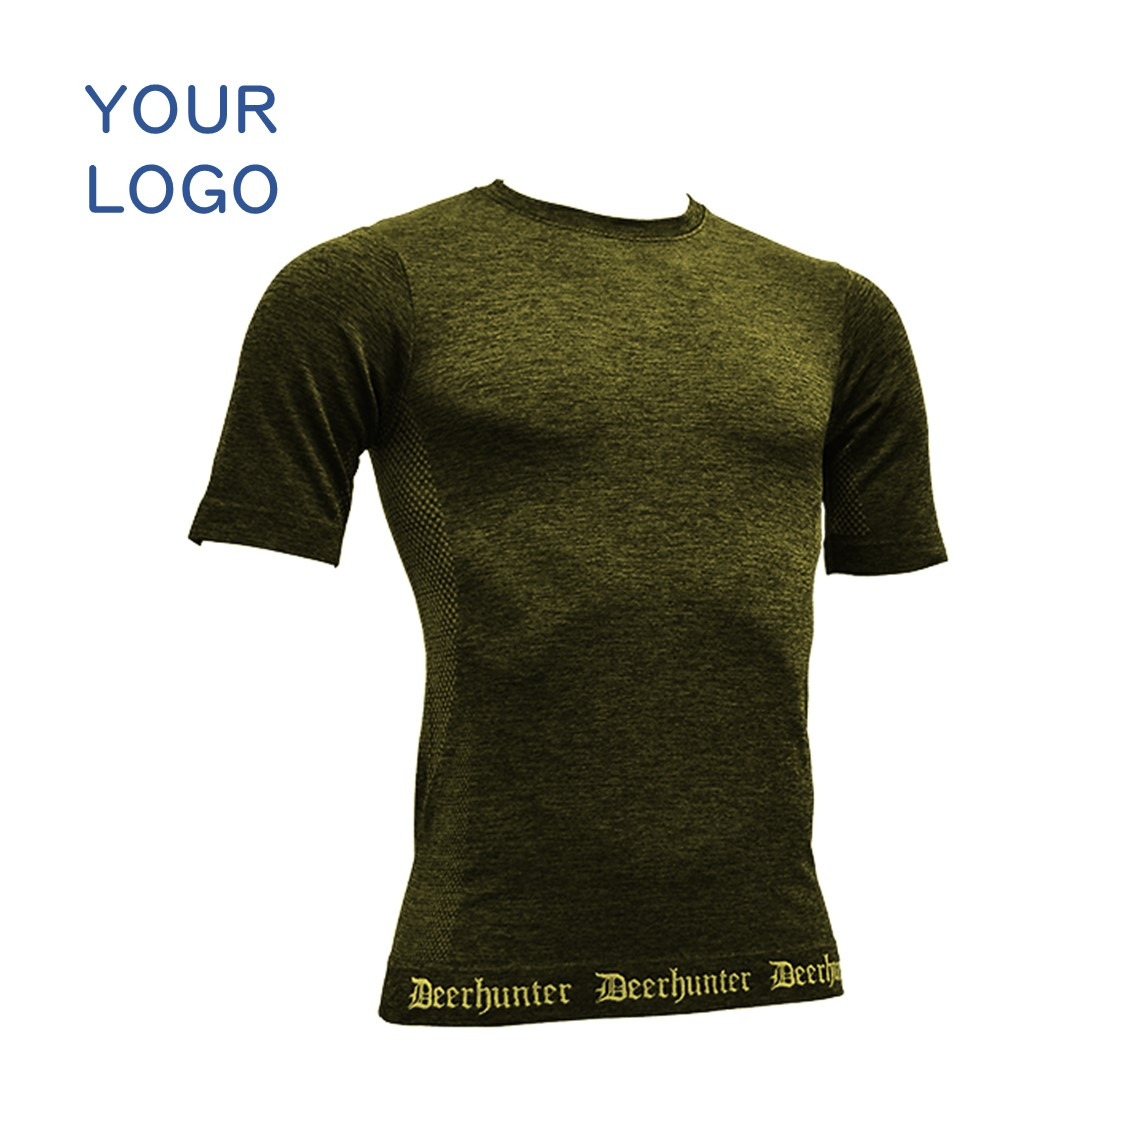 Custom sports wear men Merino Wool anti bacteria short sleeve t shirt